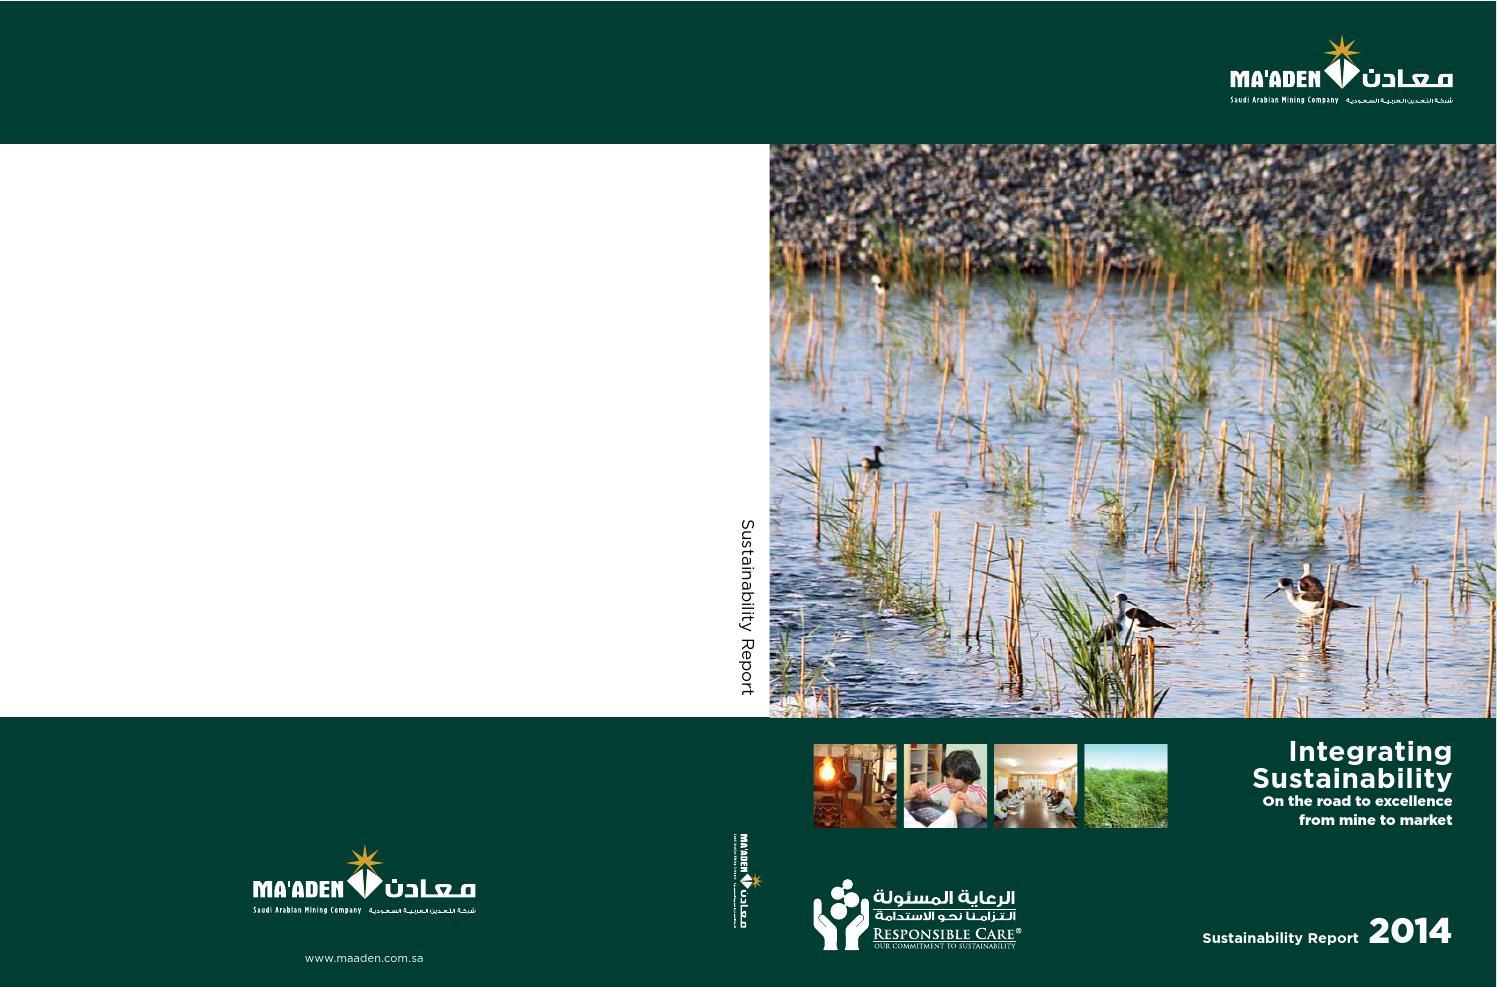 2014 Sustainability Report by Maaden - Saudi Arabian Mining